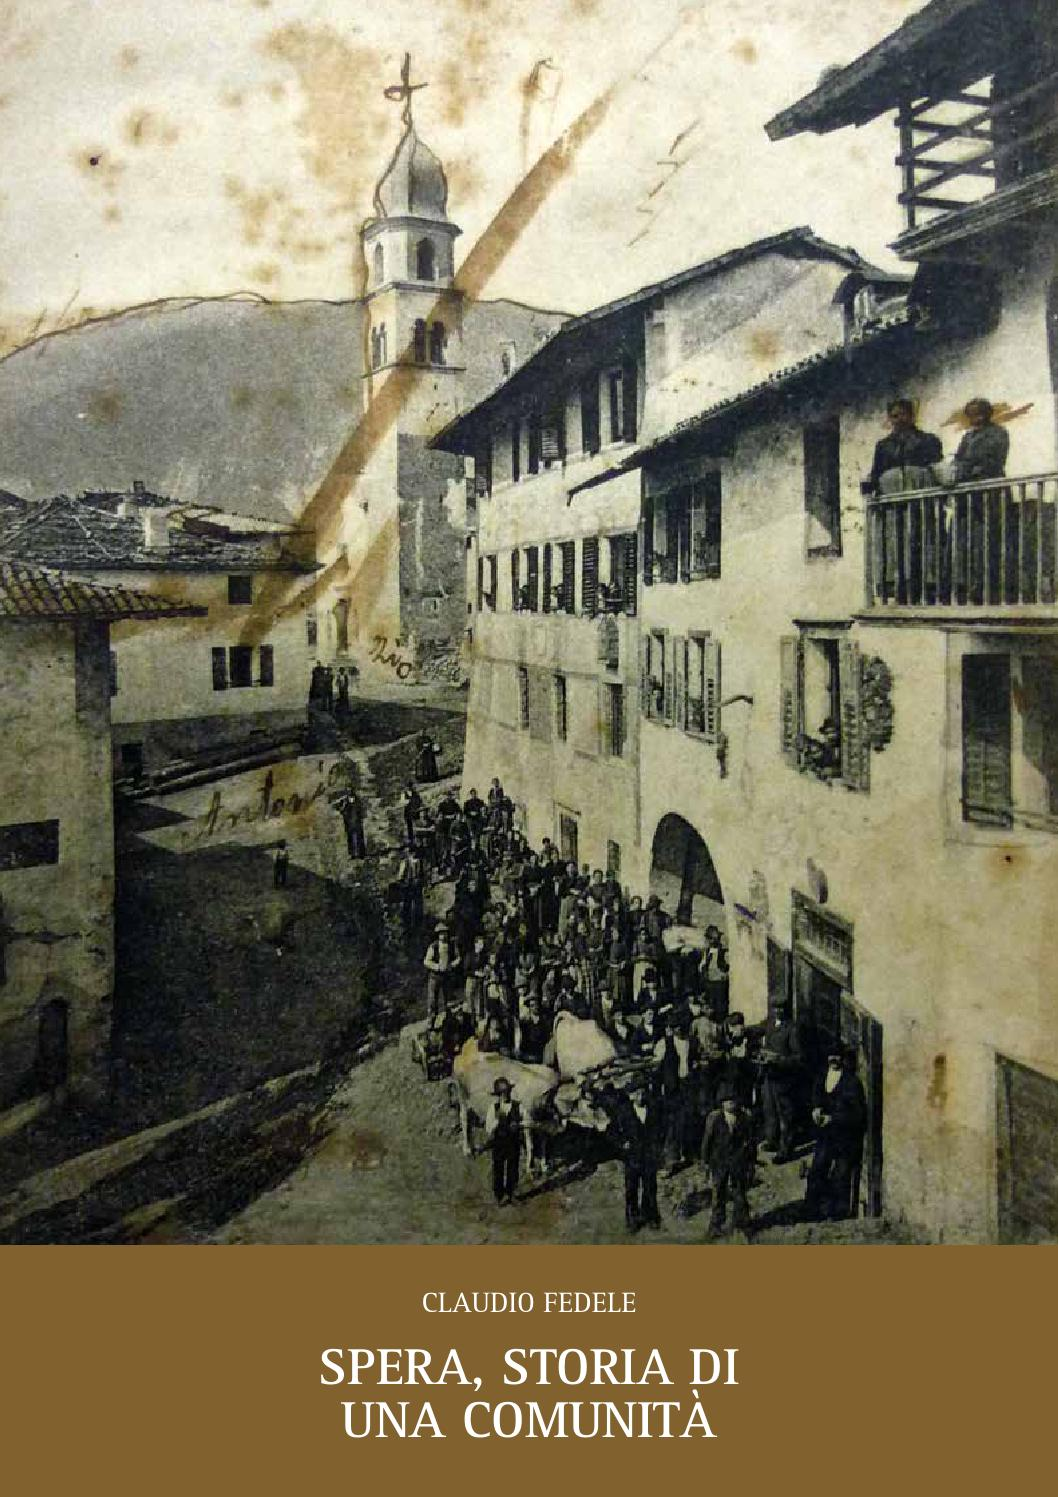 Spera storia di una comunit by ecomuseo valsugana issuu for 1 1 2 casa di storia